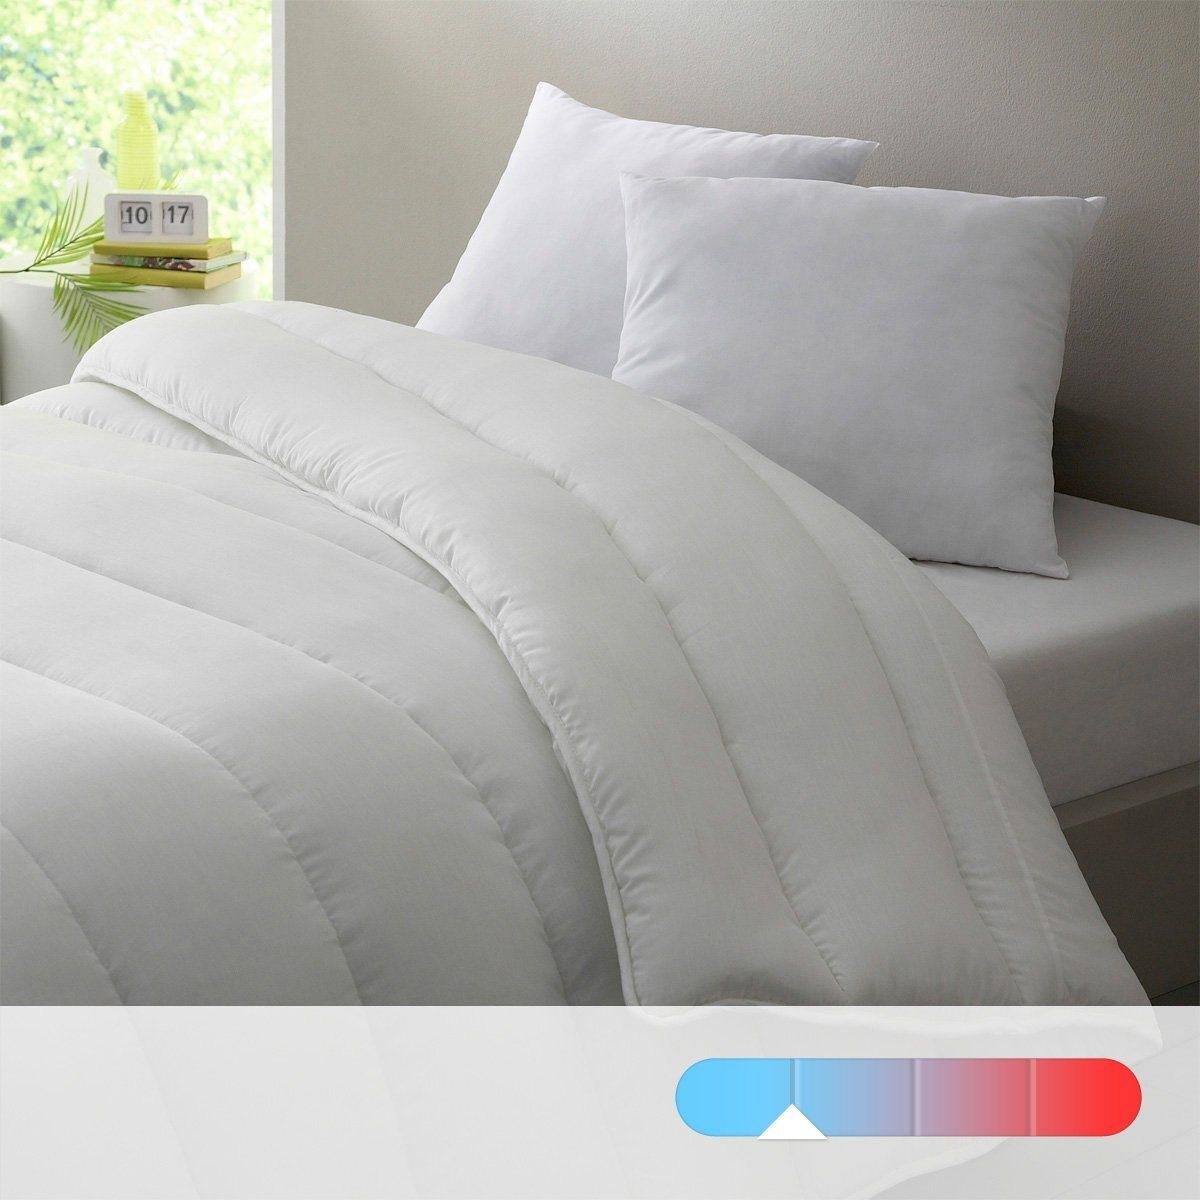 купить Синтетическое La Redoute Одеяло LA REDOUTE CREATION гм 75 x 120 см белый по цене 1549 рублей